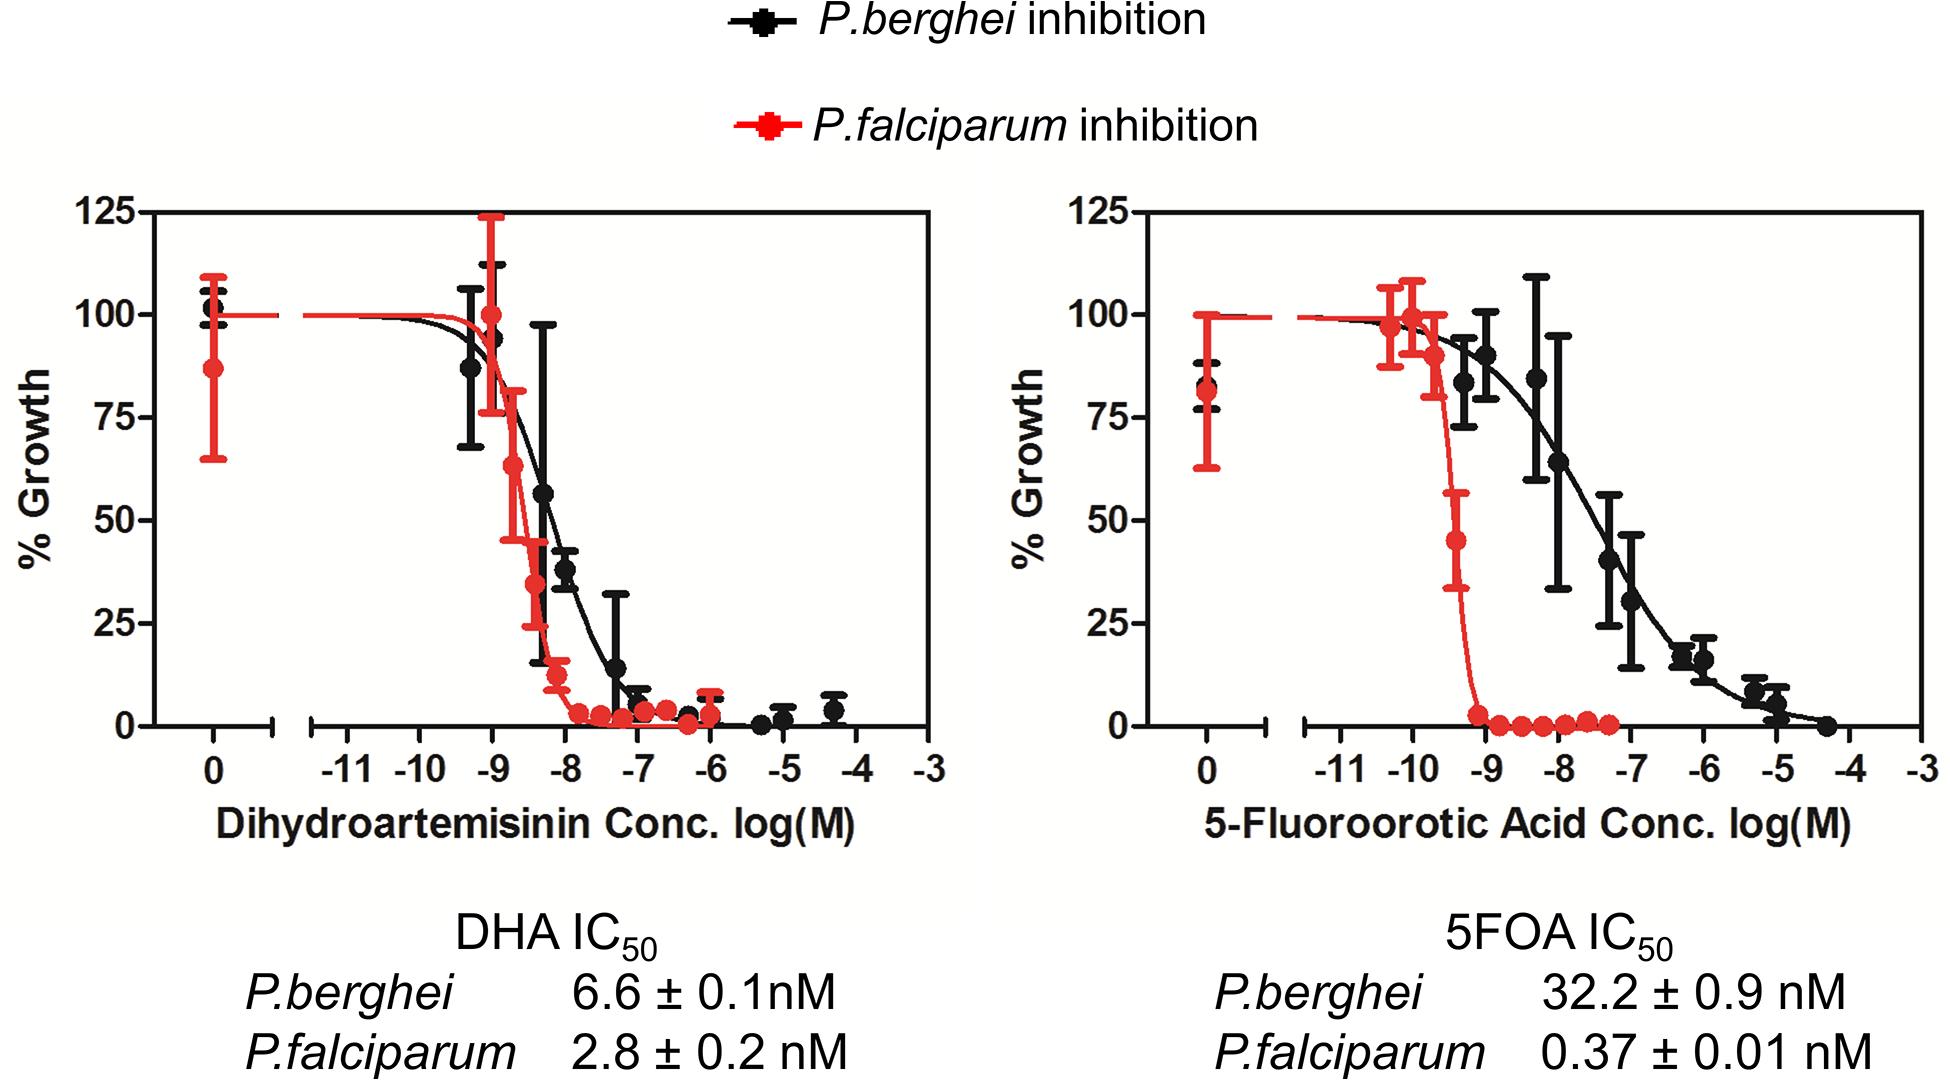 <i>P</i>. <i>berghei</i> and <i>P</i>. <i>falciparum</i> inhibition by dihydroartemisinin (DHA) and 5-fluoroorotic acid (5FOA) <i>in vitro</i>.